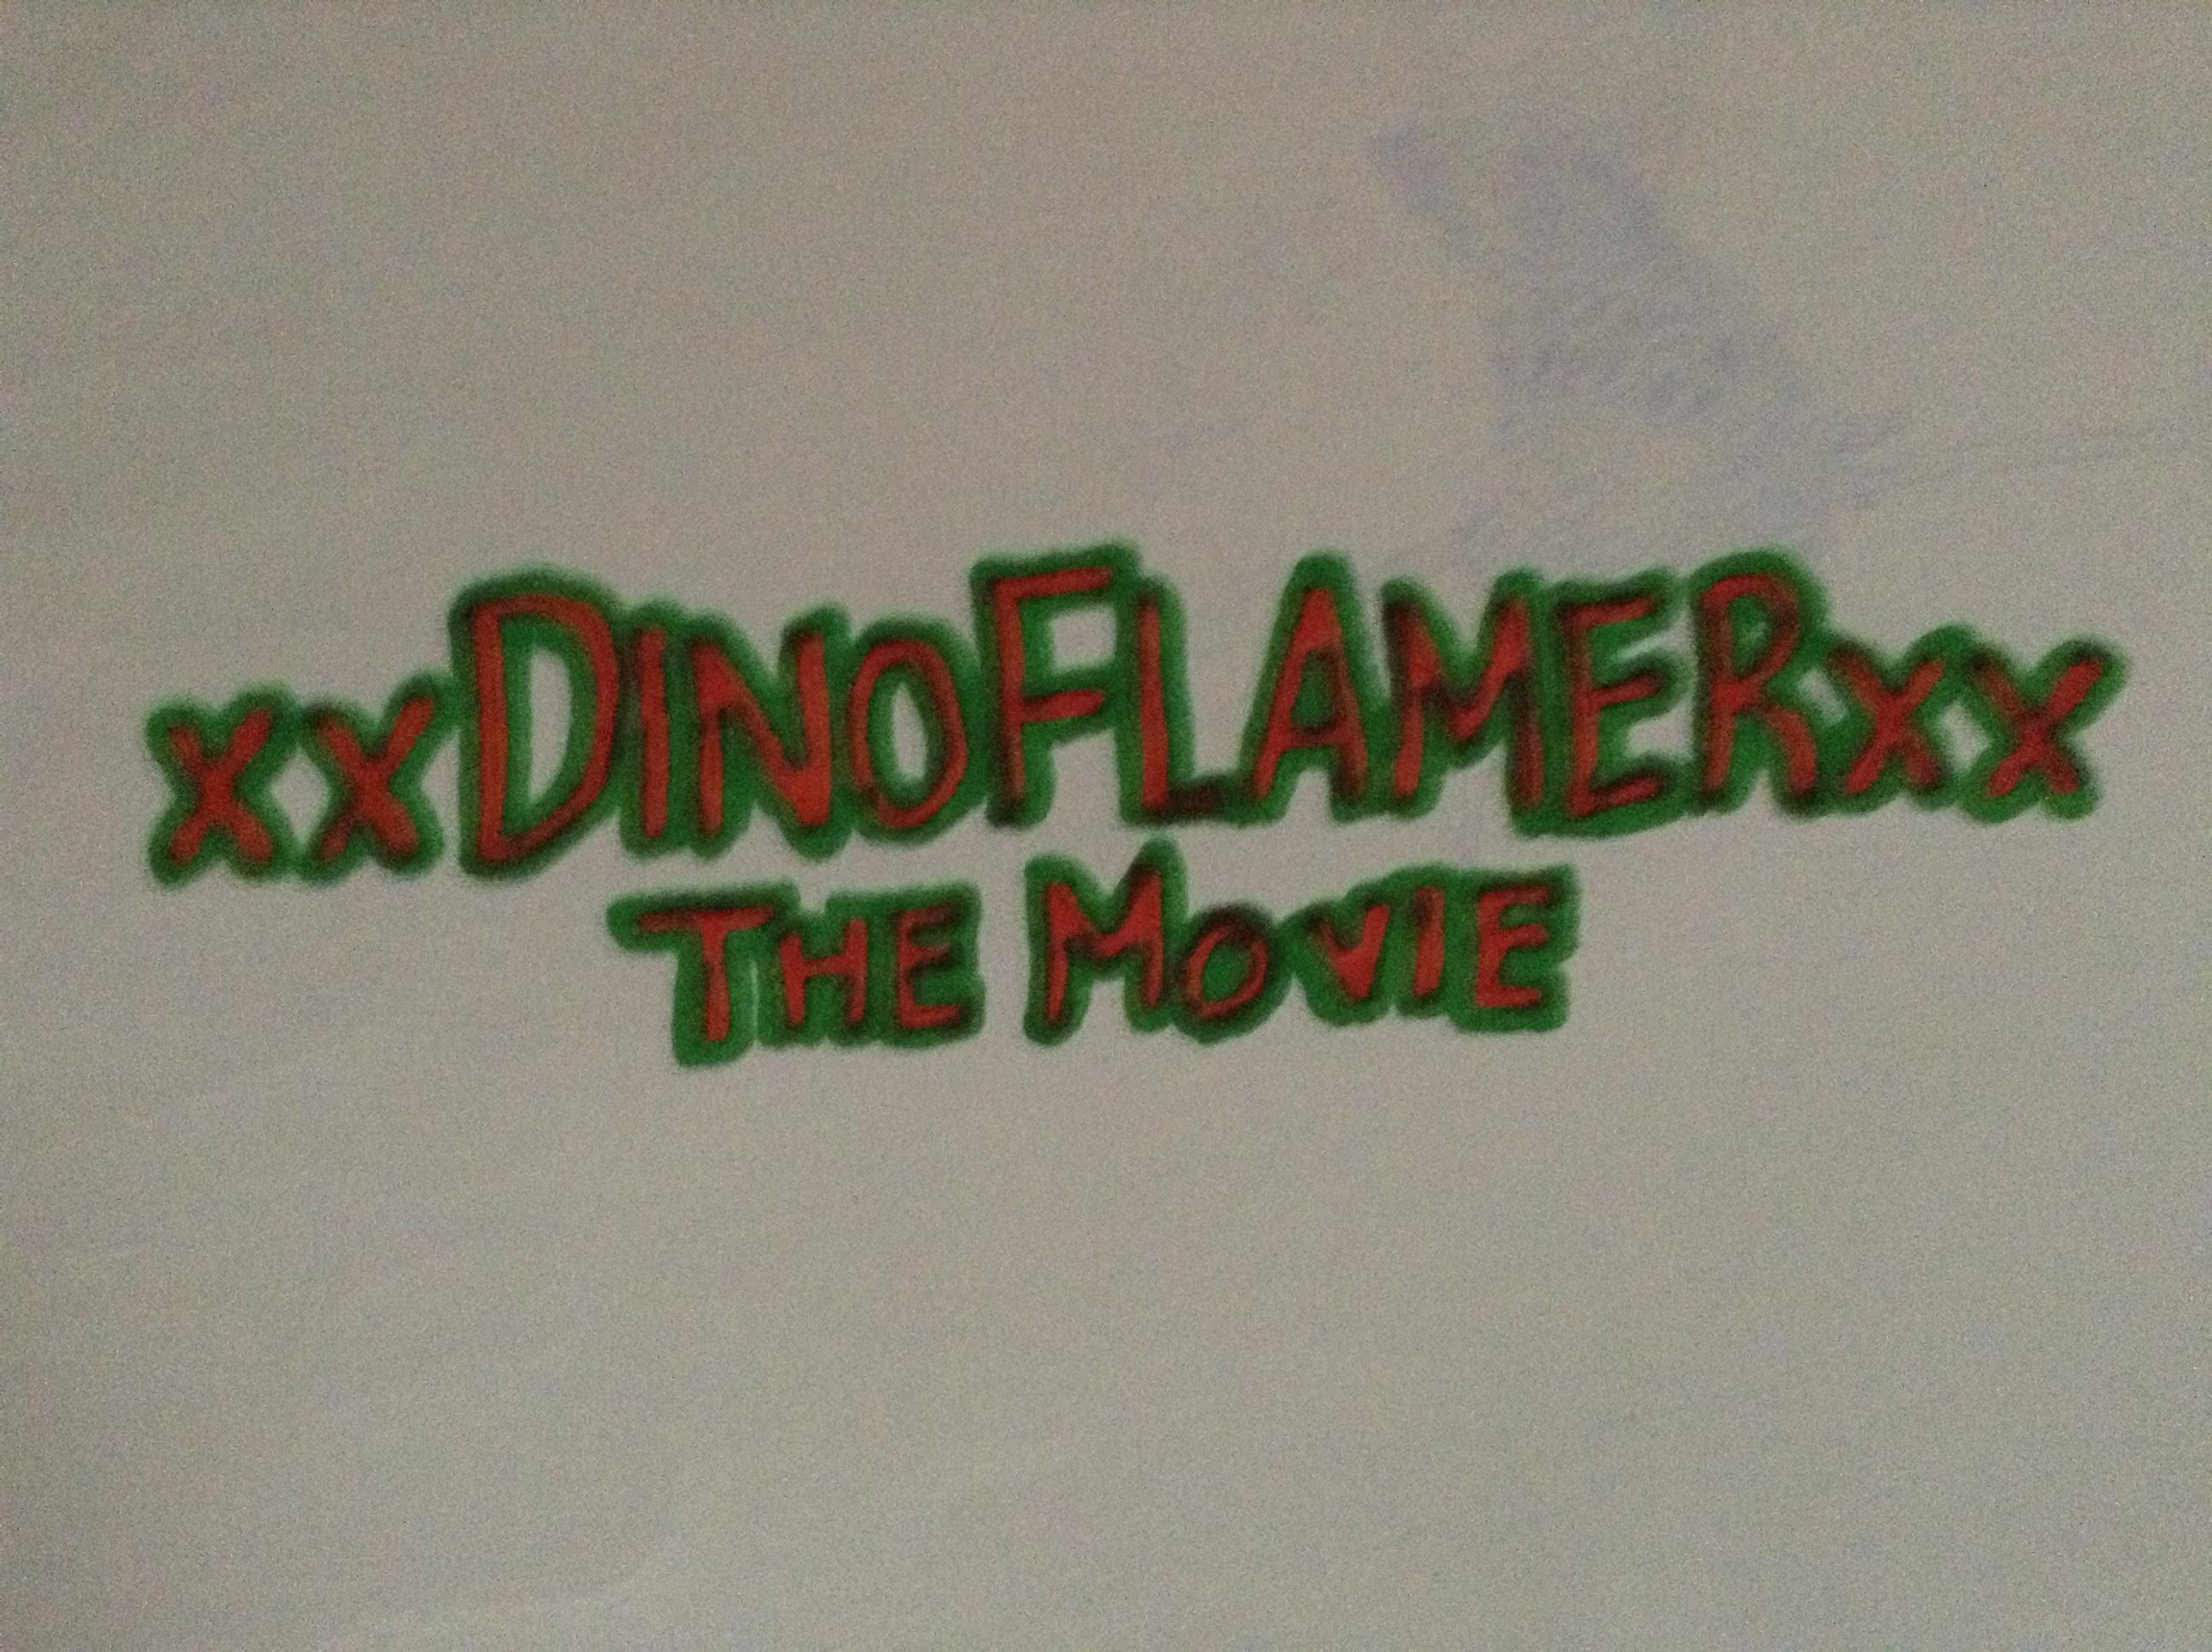 xxDinoFlamerxx -The Movie CONTEST!!! by FazbearClaim